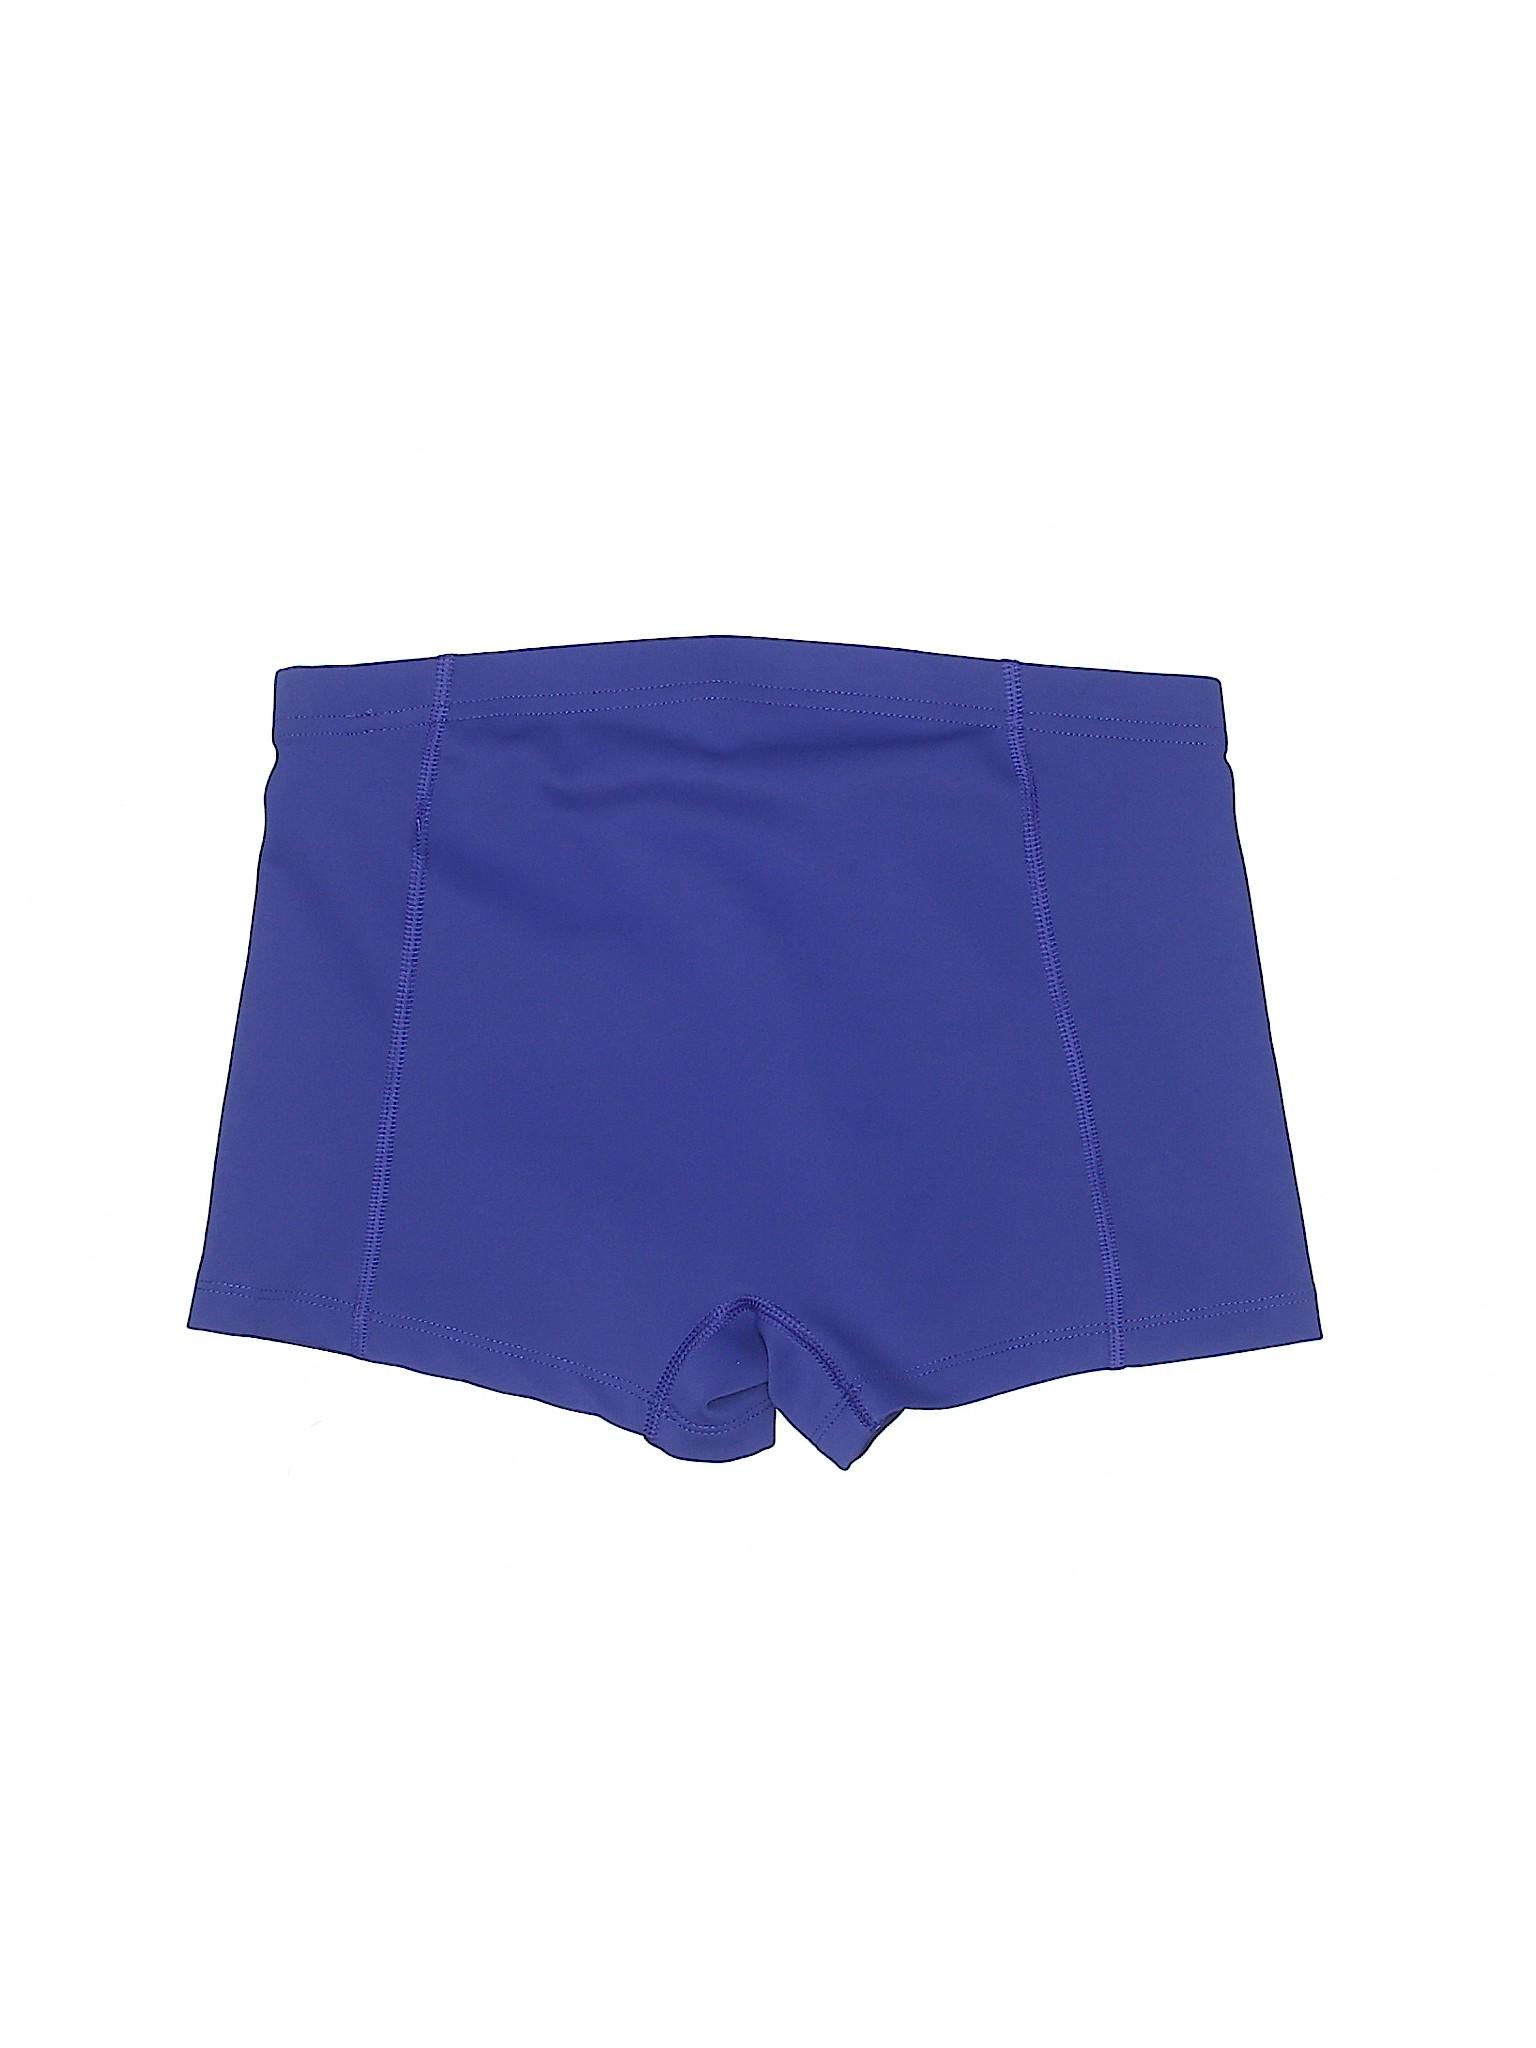 Athletic Boutique Balance leisure Shorts New TwXtfXqr